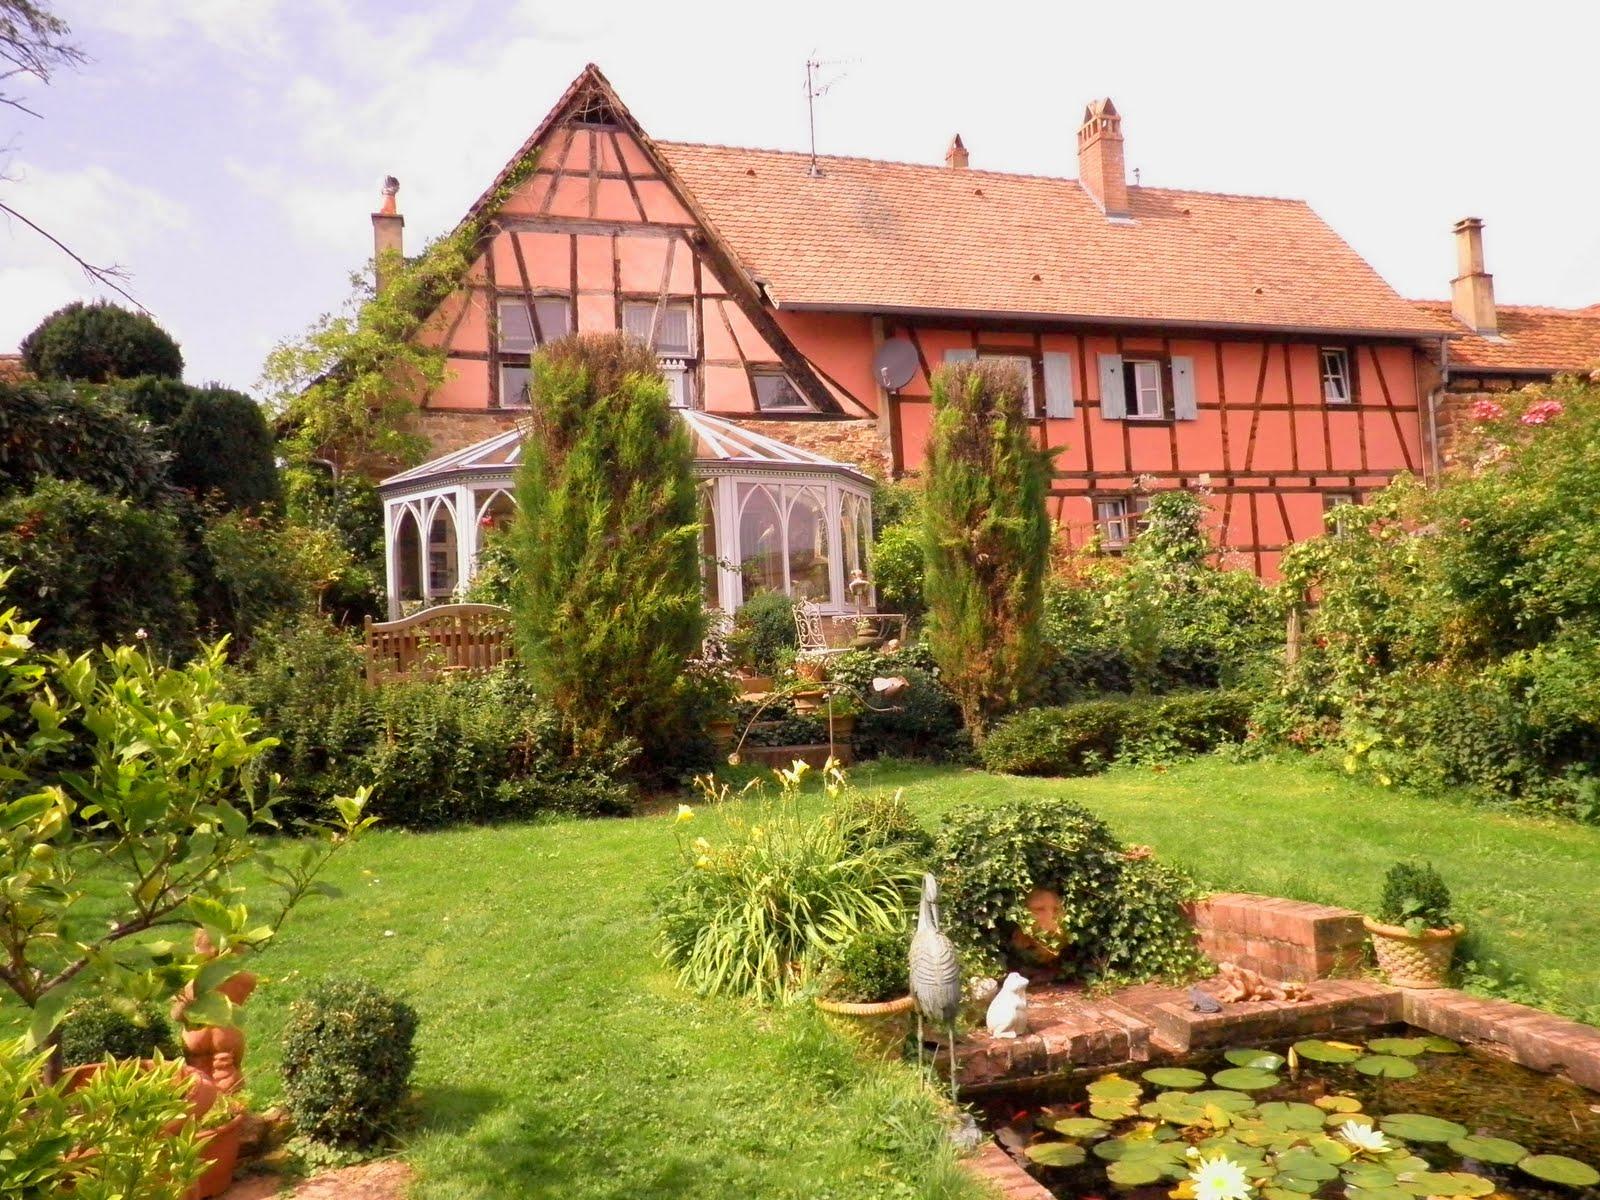 Charlotte Boxon Jardin merveilleux au pays du Kougelhopf